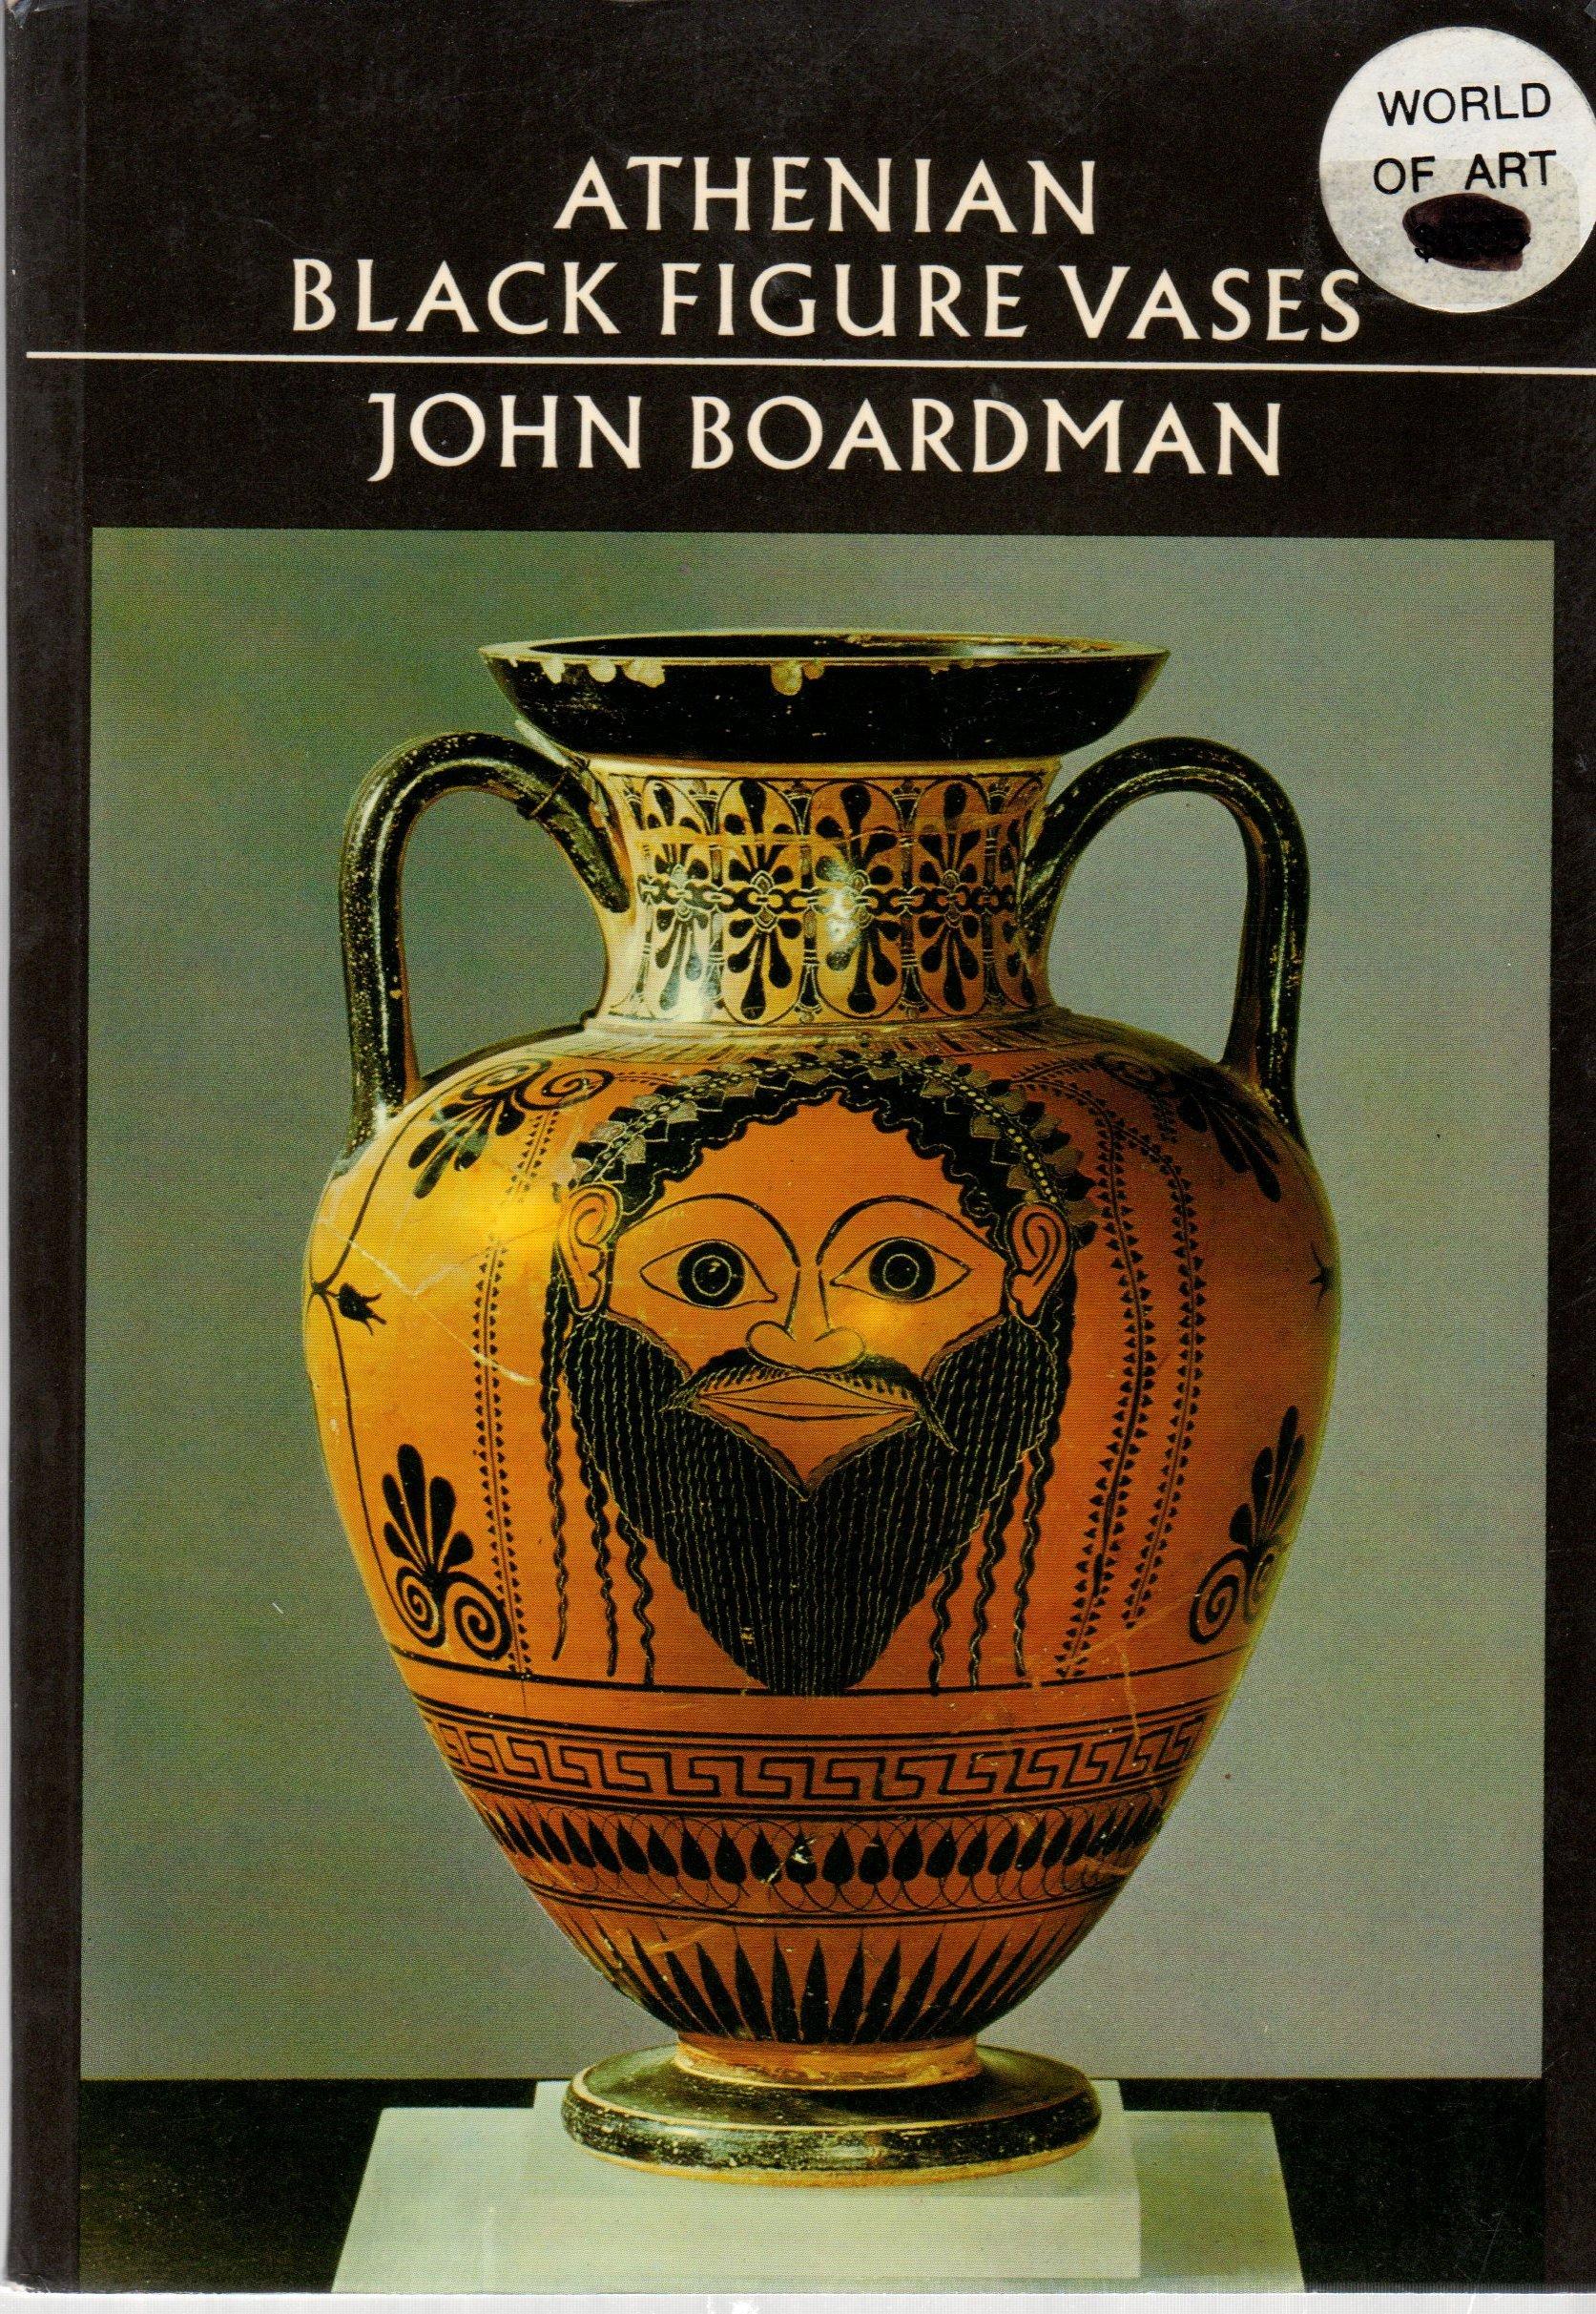 Athenian Black Figure Vases: Amazon.com: Books